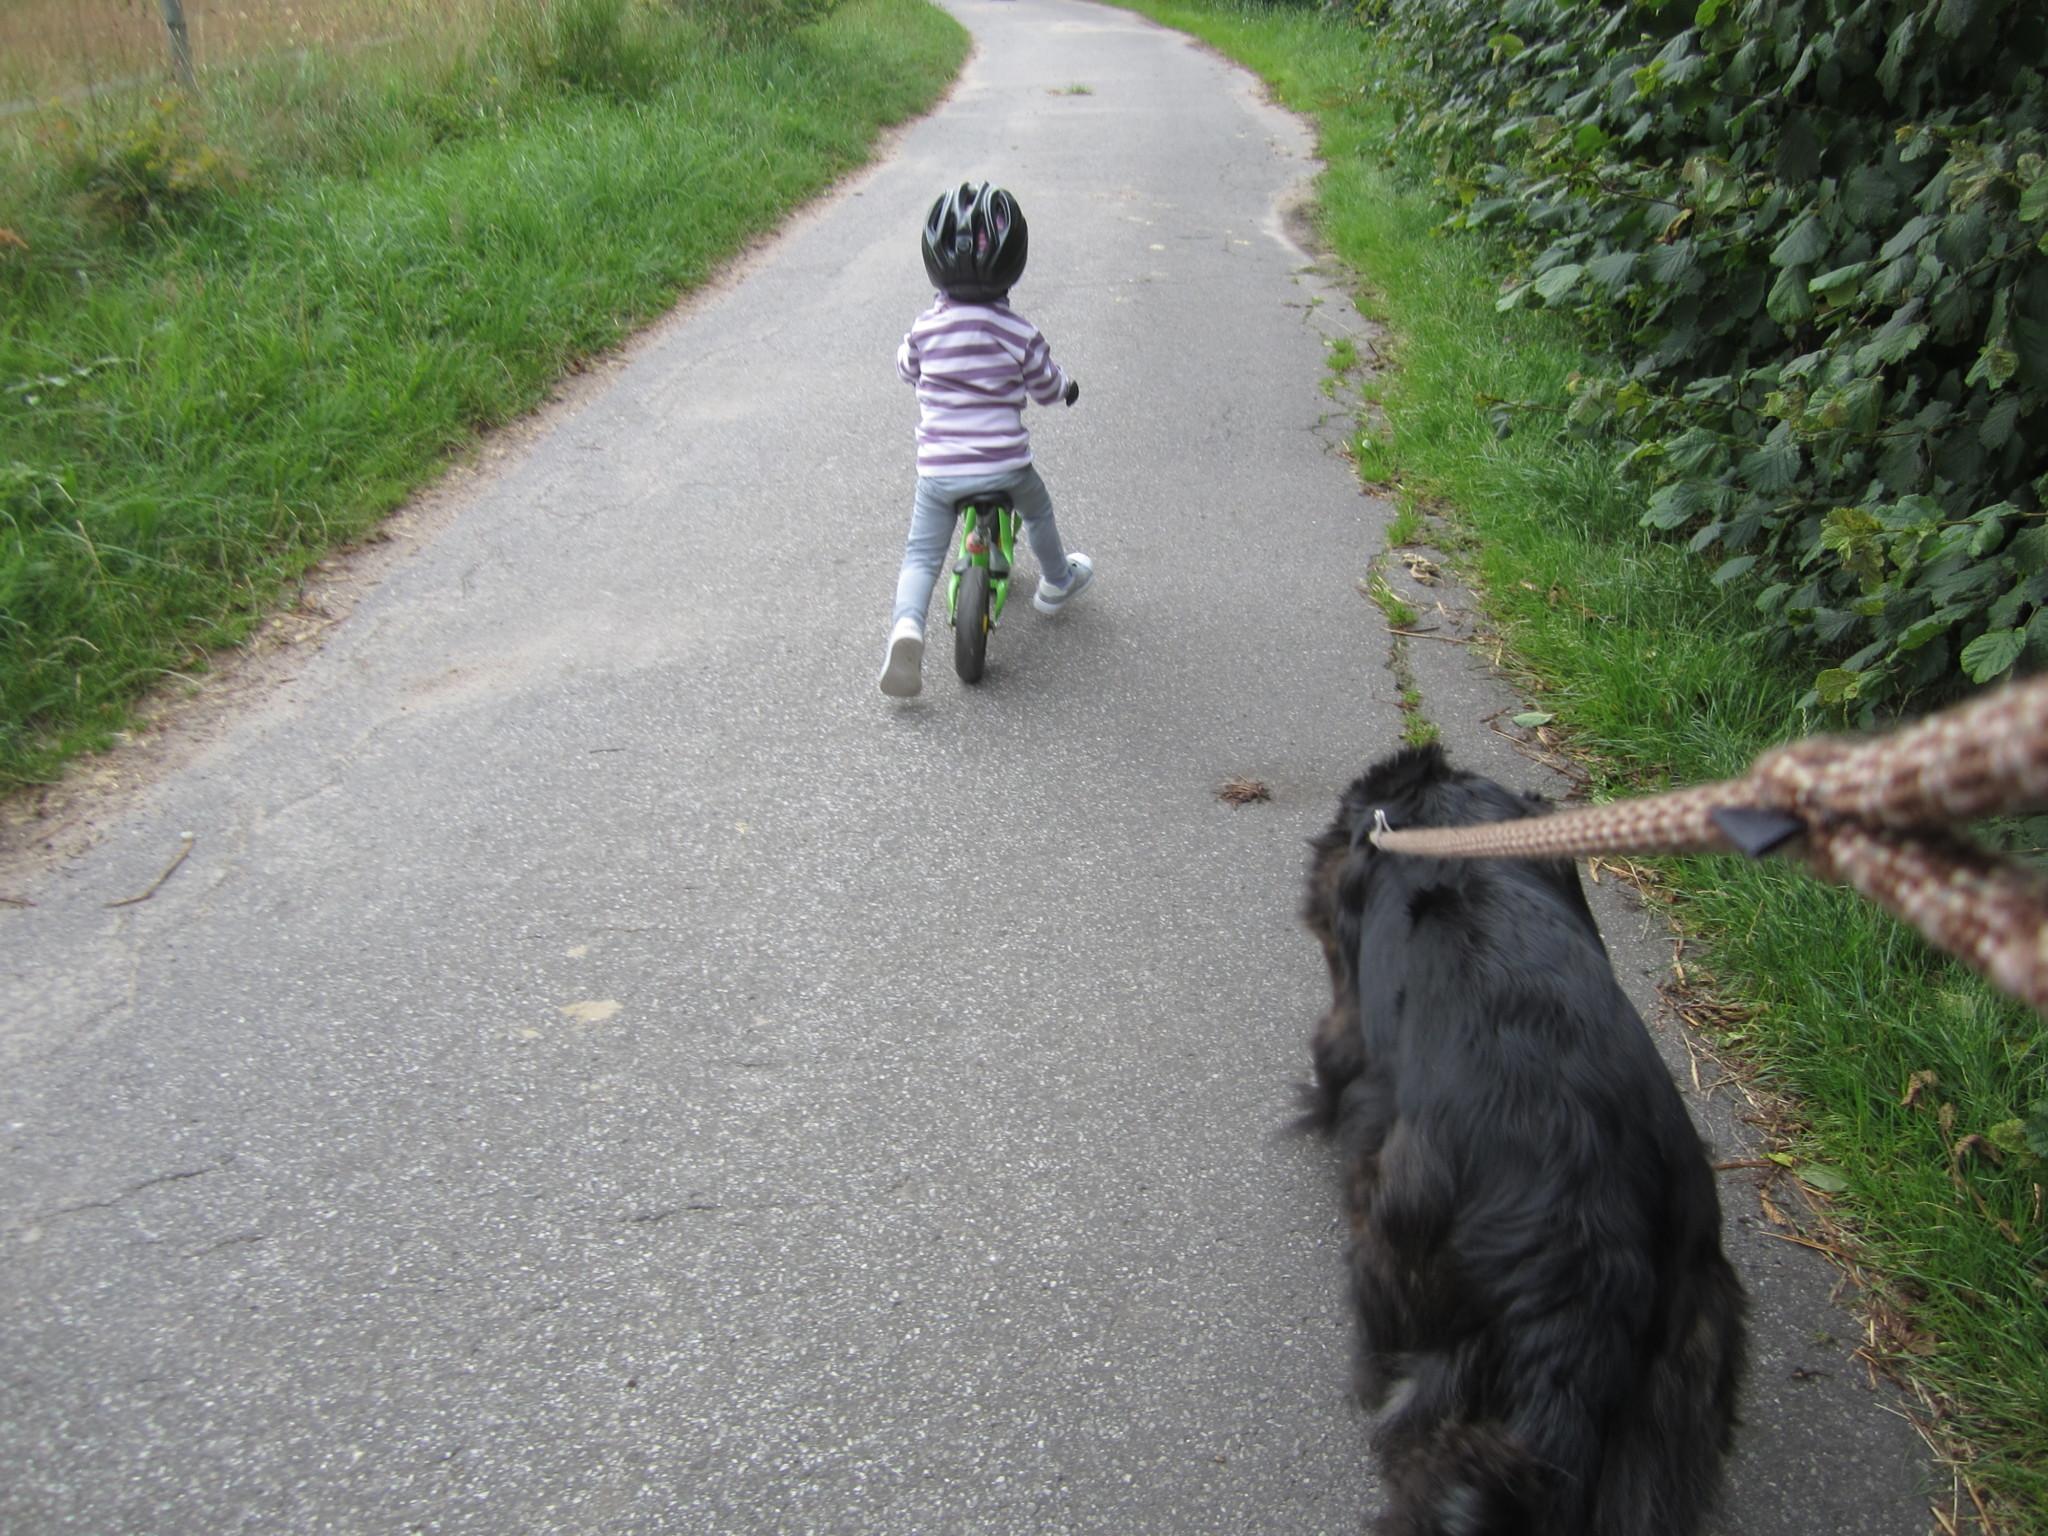 regen hund hinterher ziehen